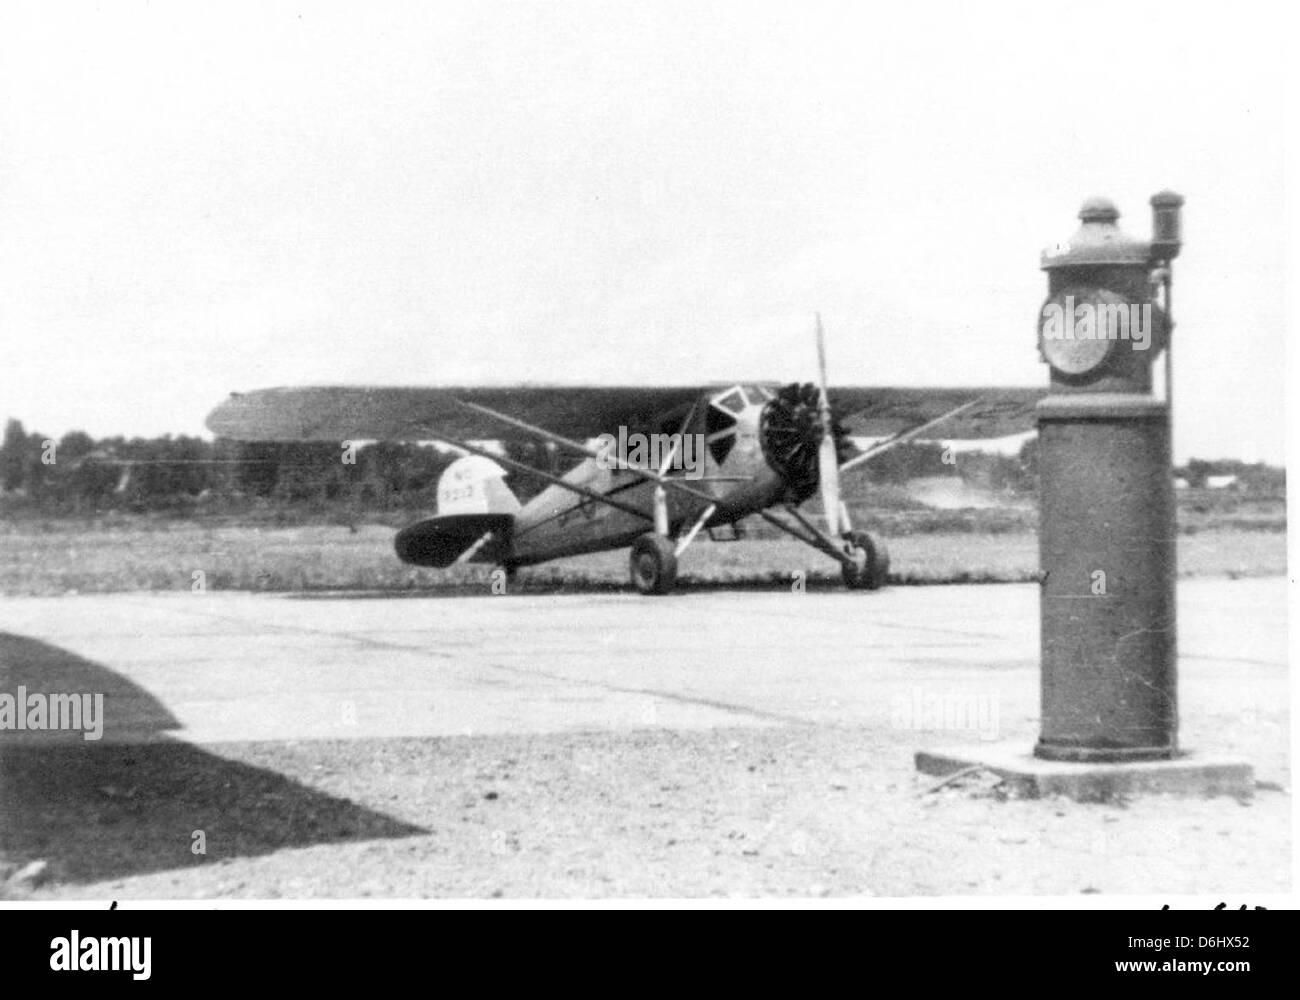 04-00960 Ryan B-1 Brougham c 1928 - Stock Image